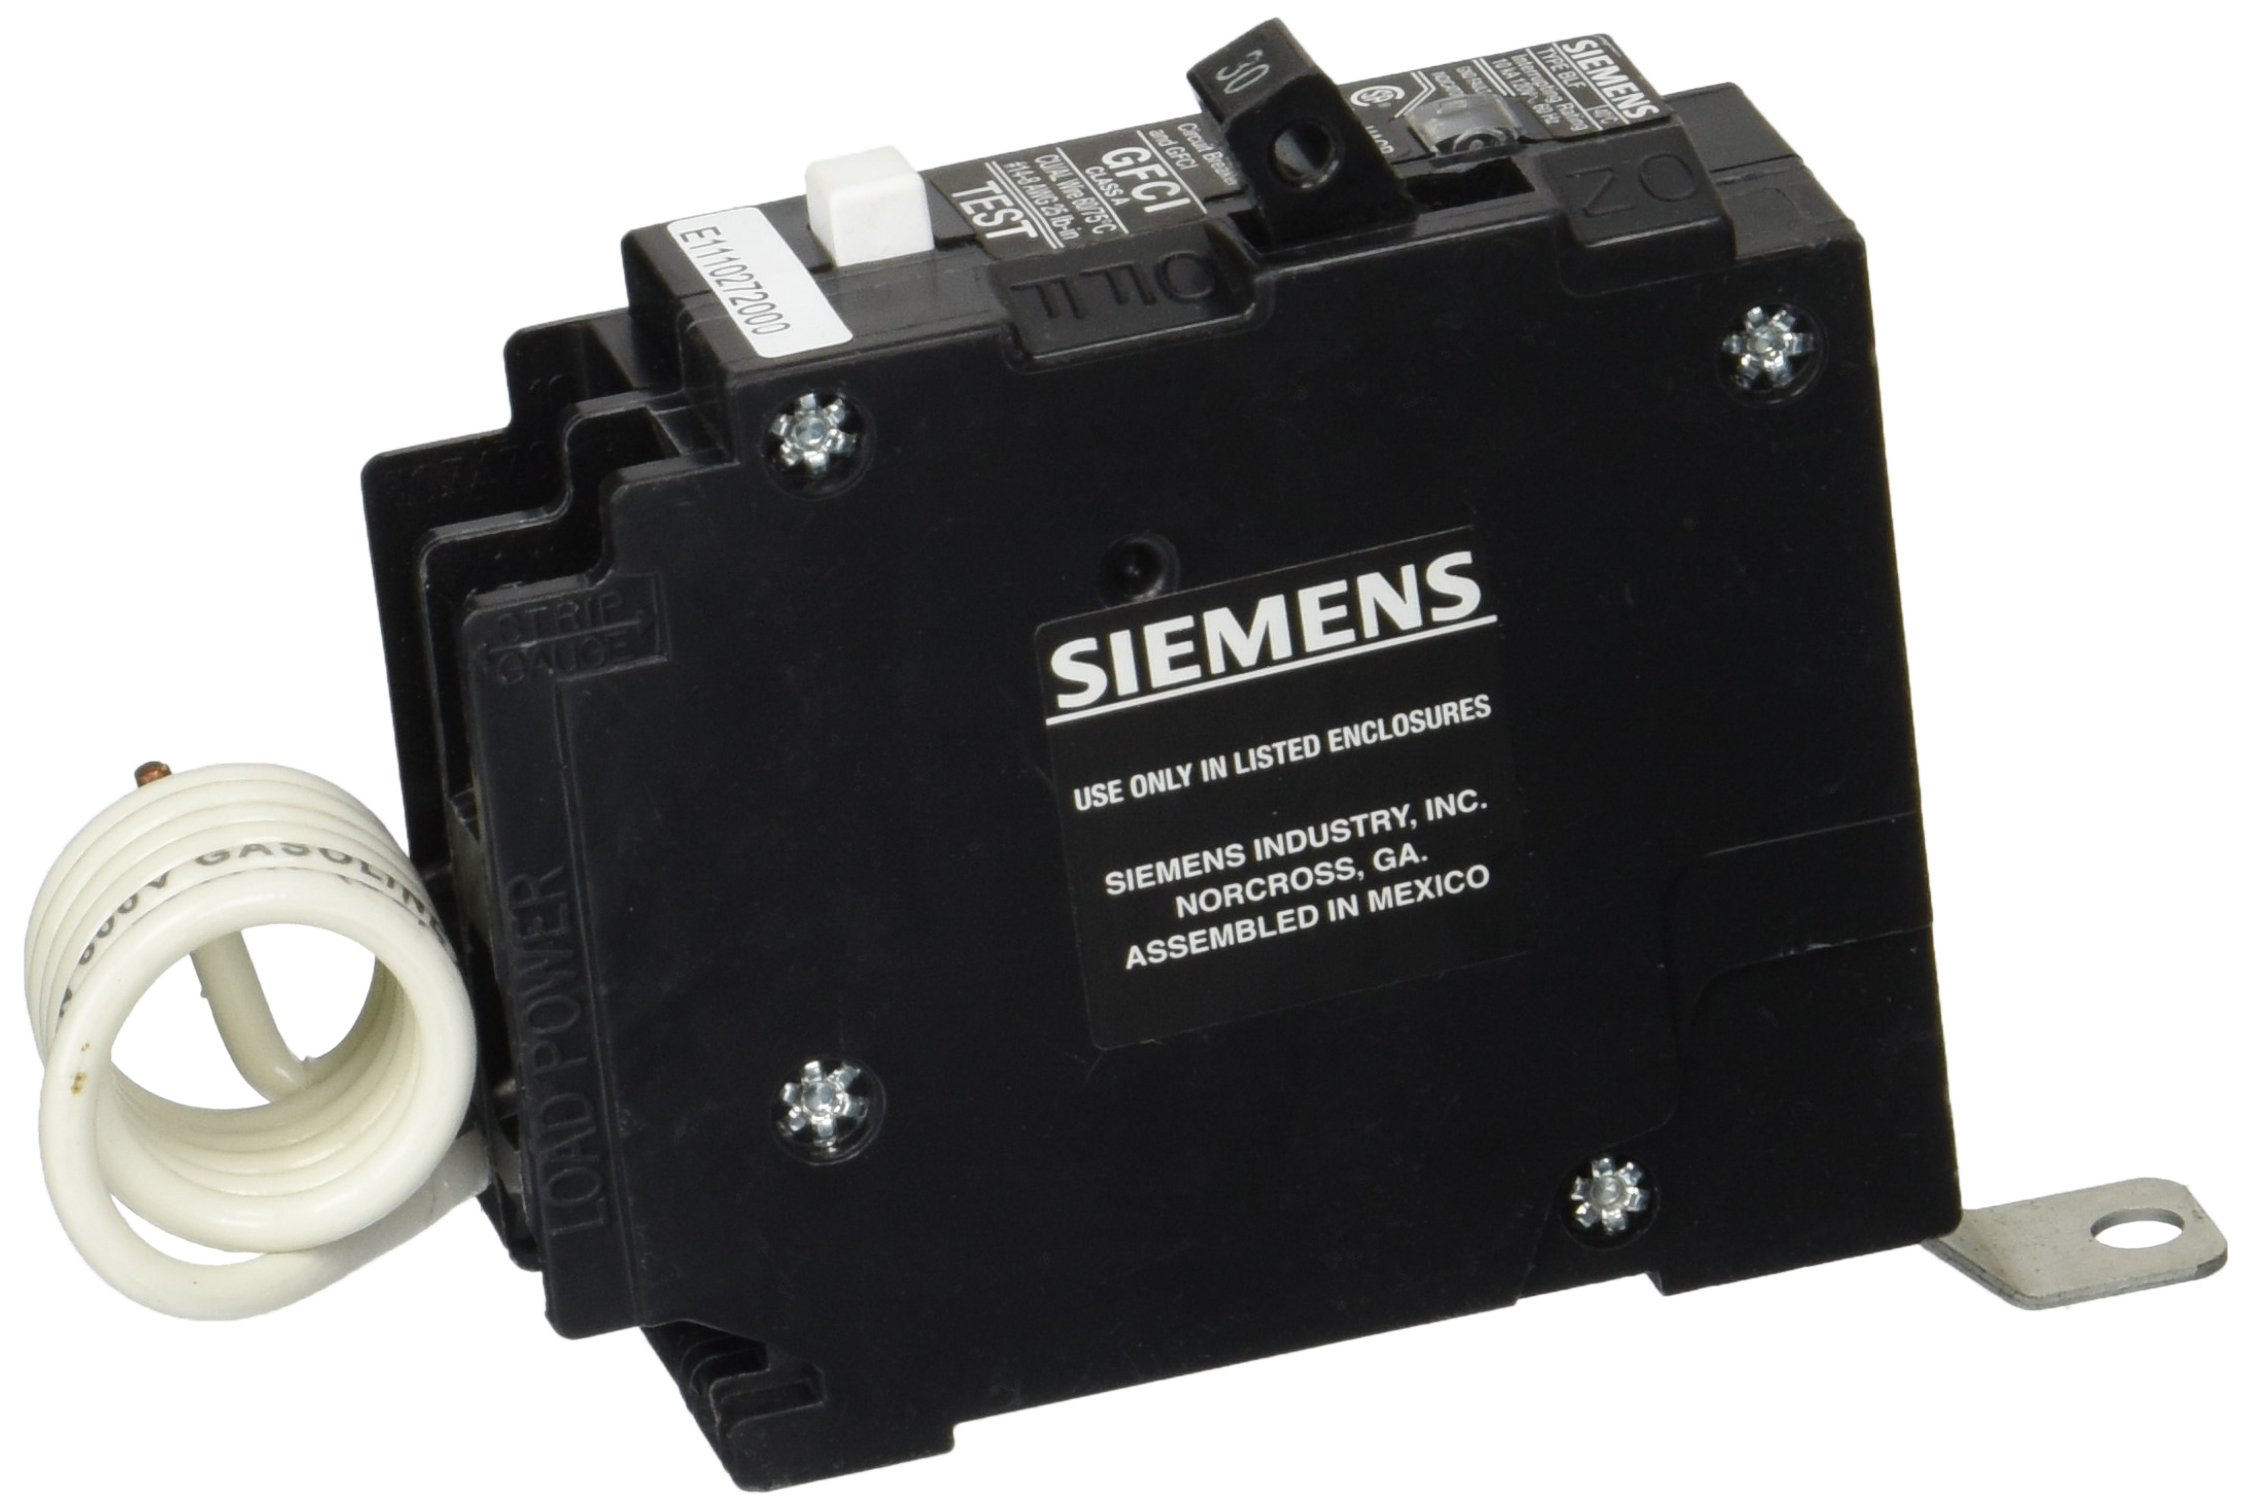 Siemens BF130 30-Amp Single Pole 120-Volt10KAIC Ground Fault Circuit interrupter